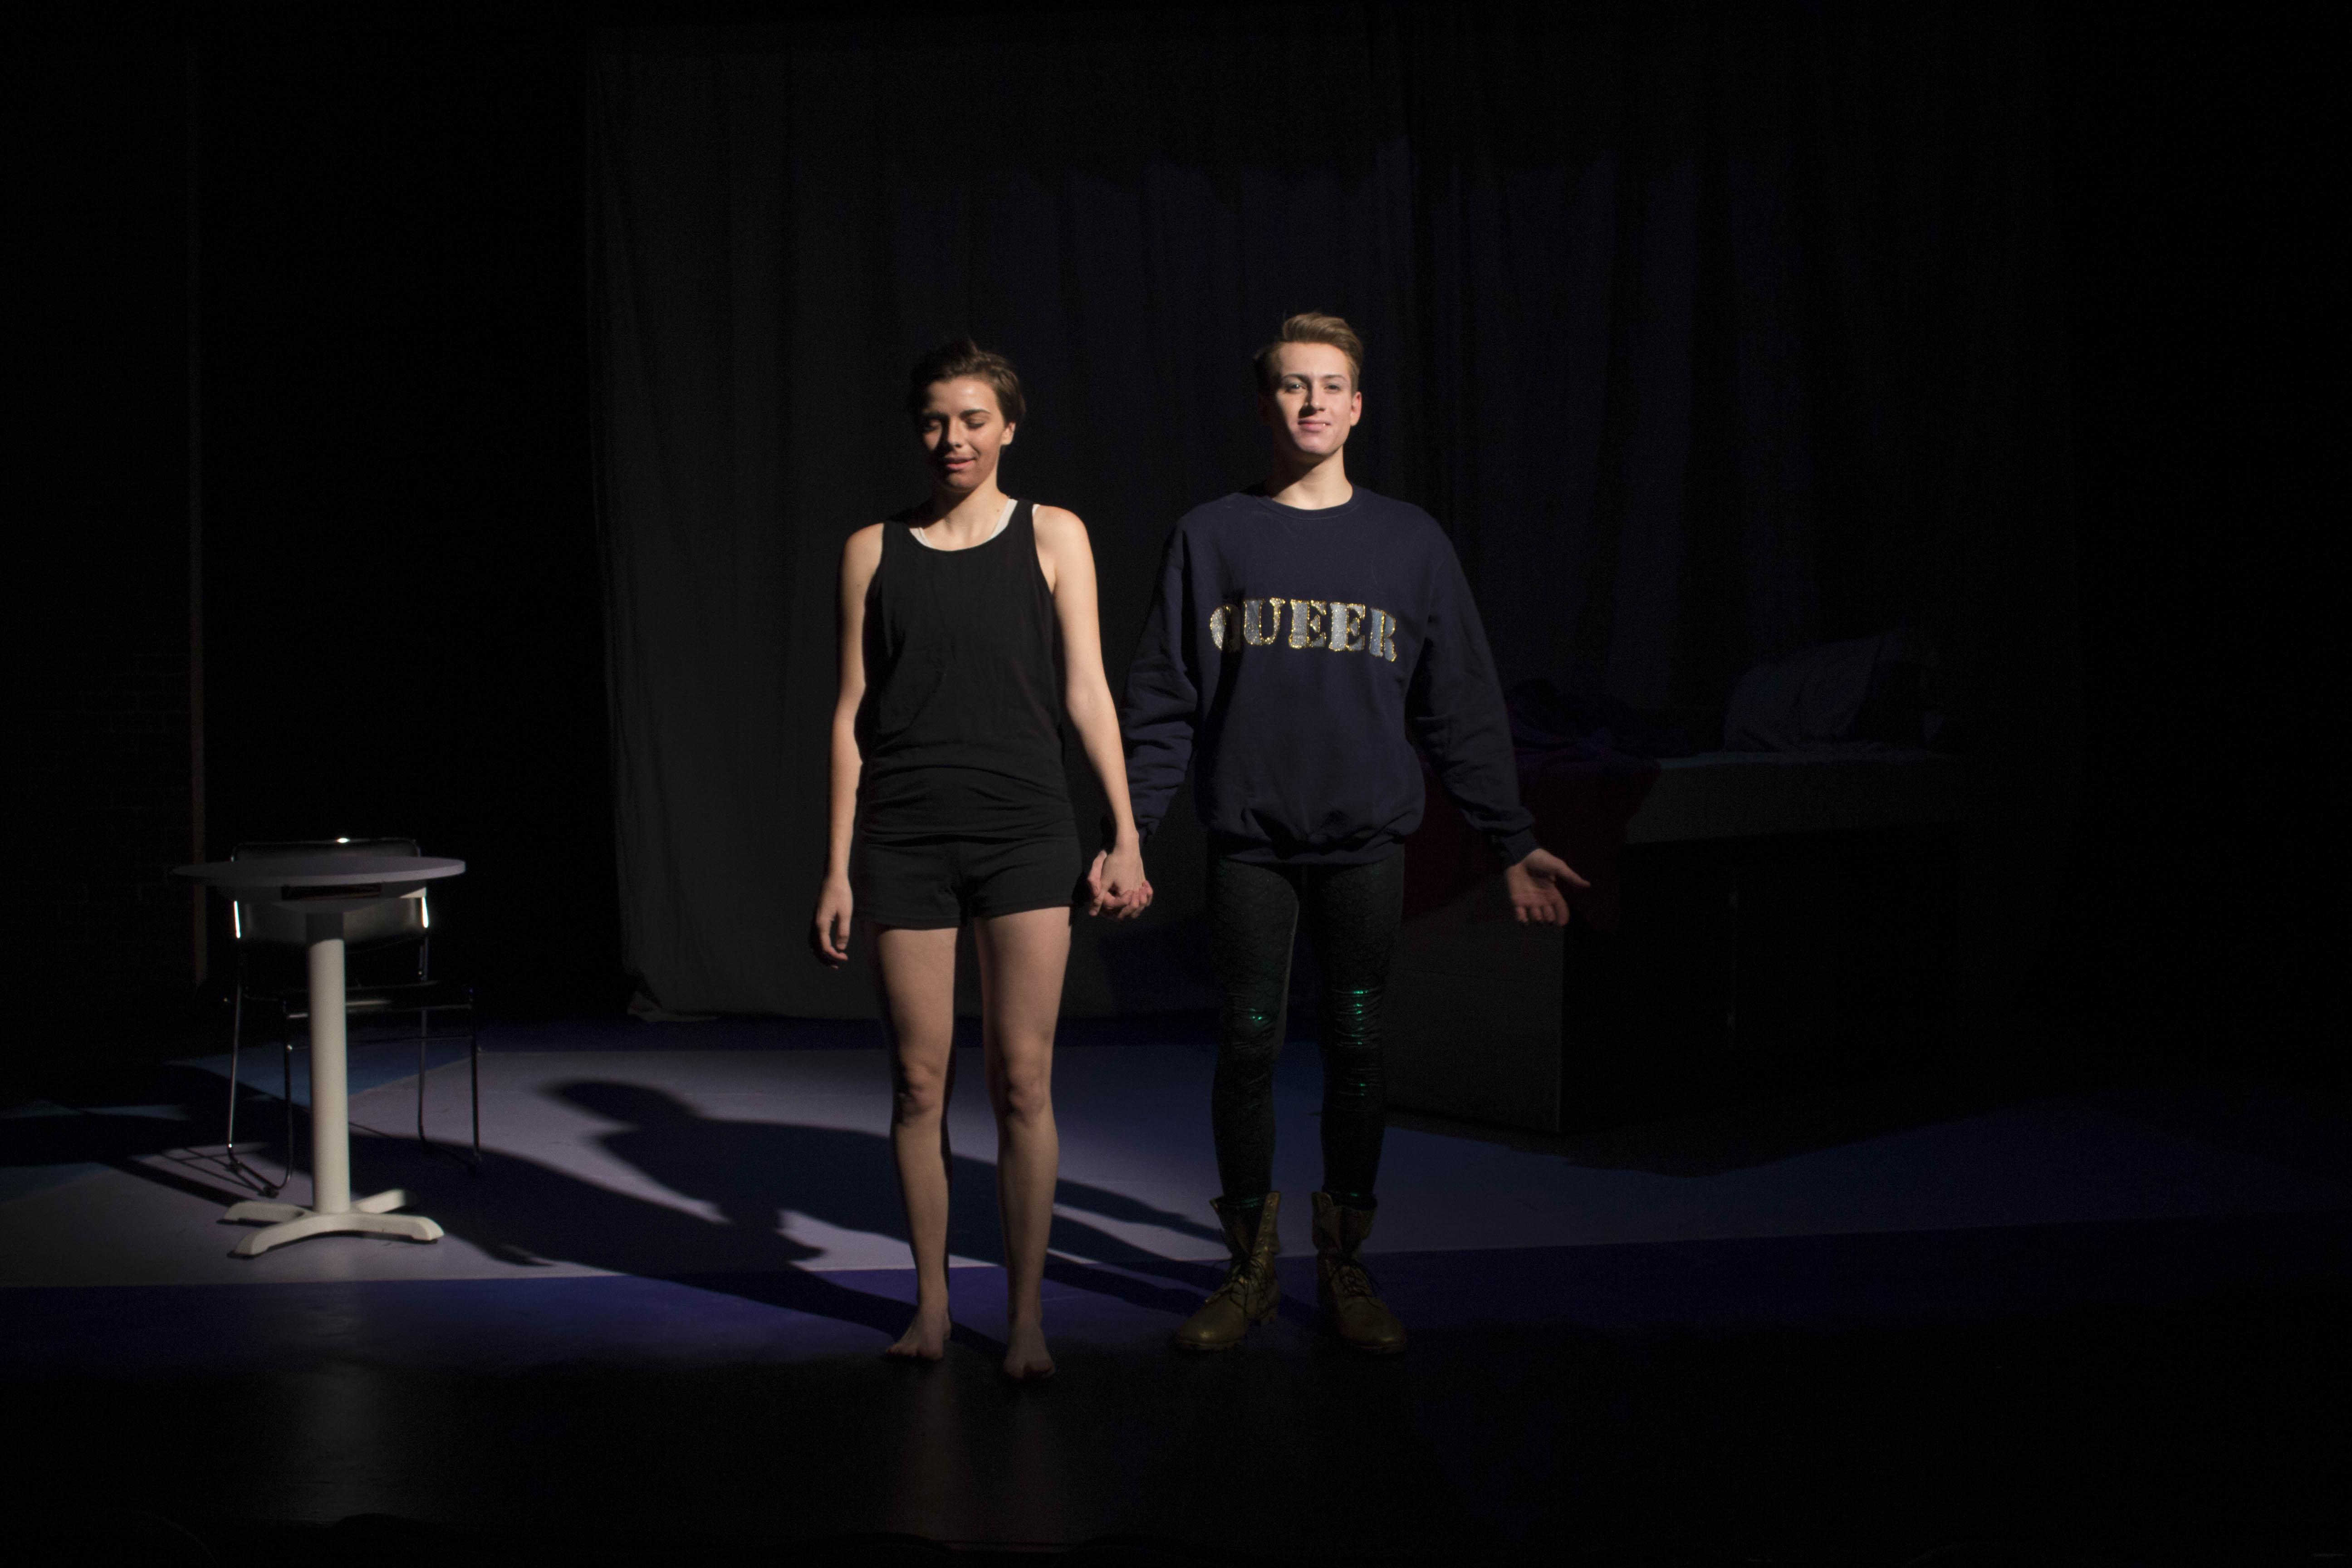 Act 3 - Final scene